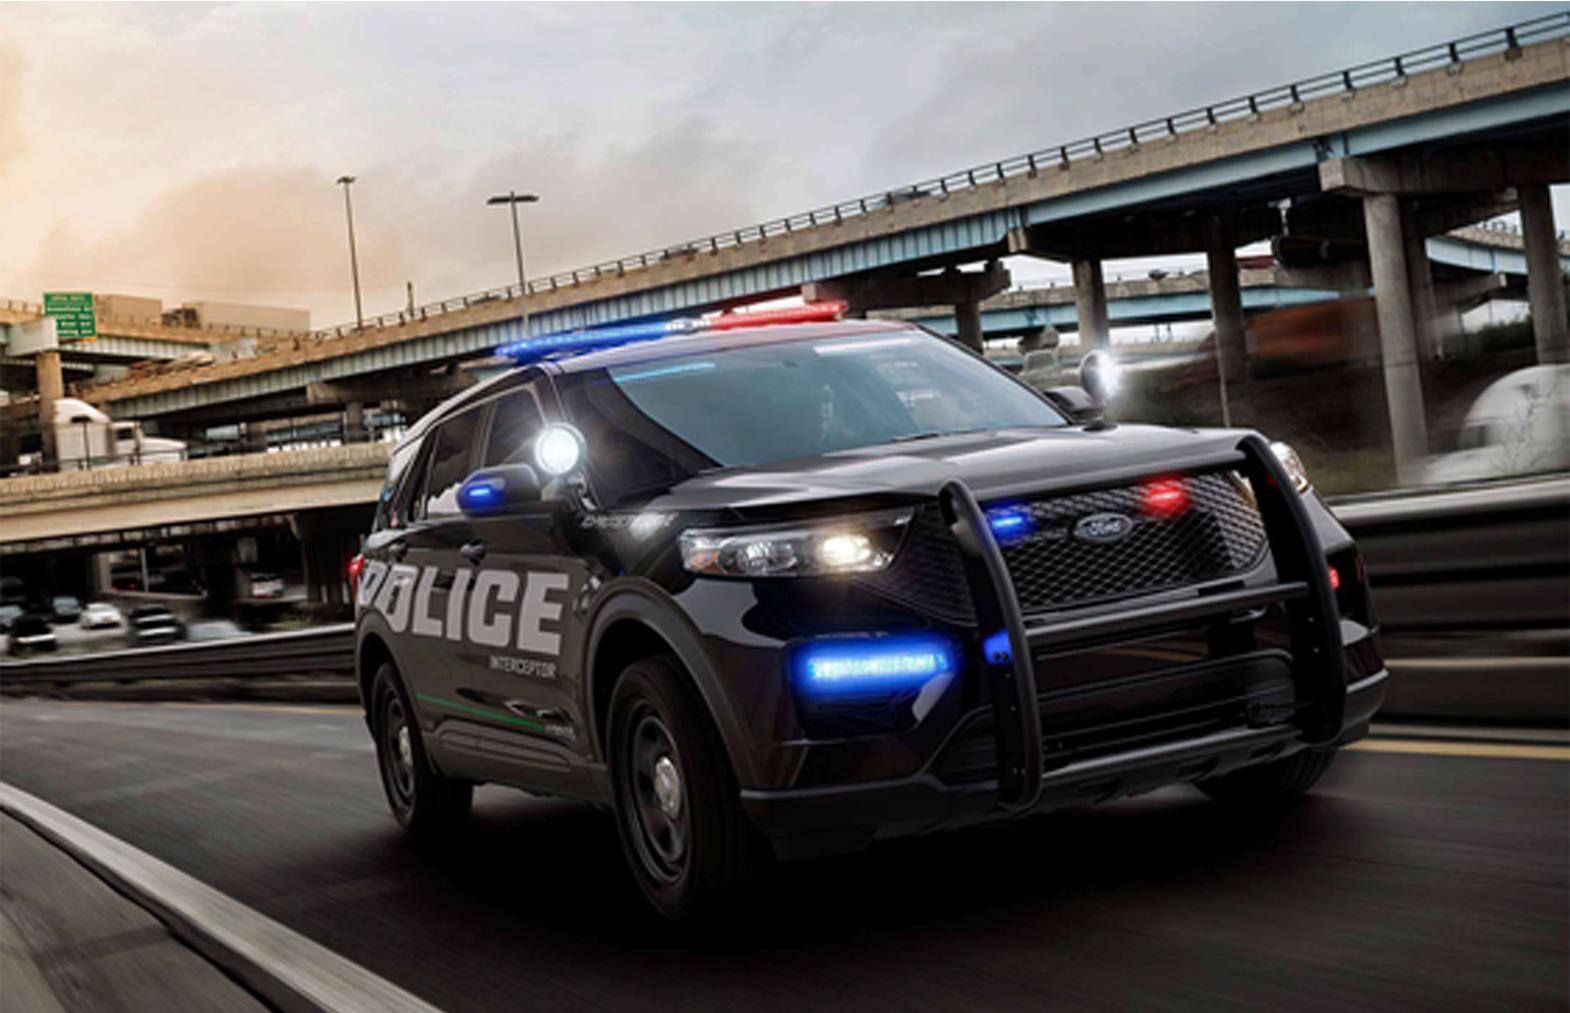 【2020 Police Interceptor Utility/ ポリスインターセプター・ユーティリティー】ポリスカー